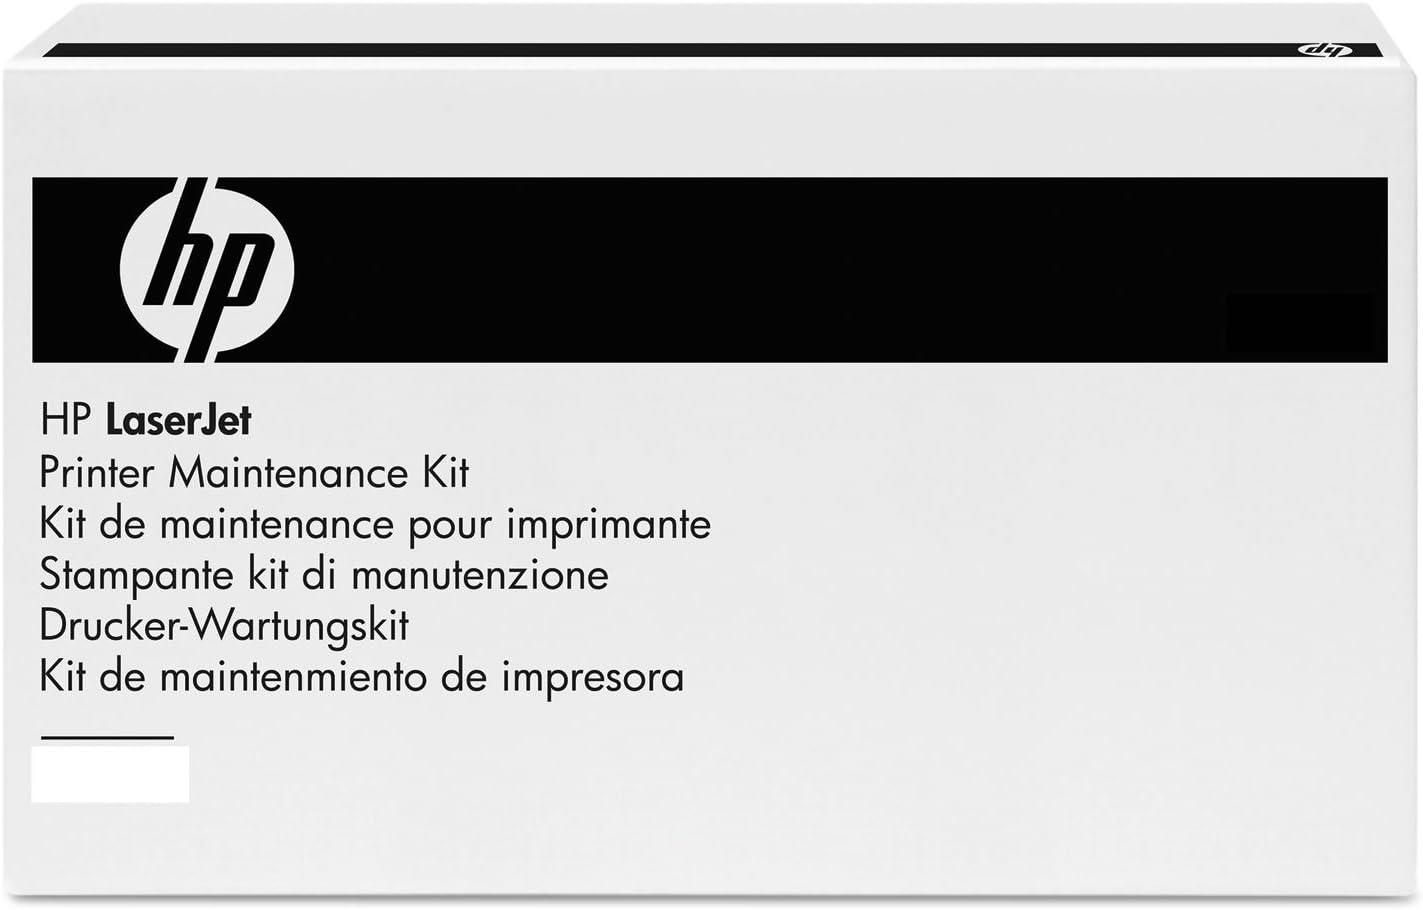 HP Q5998A Maintenance Kit, Laserjet, M4345